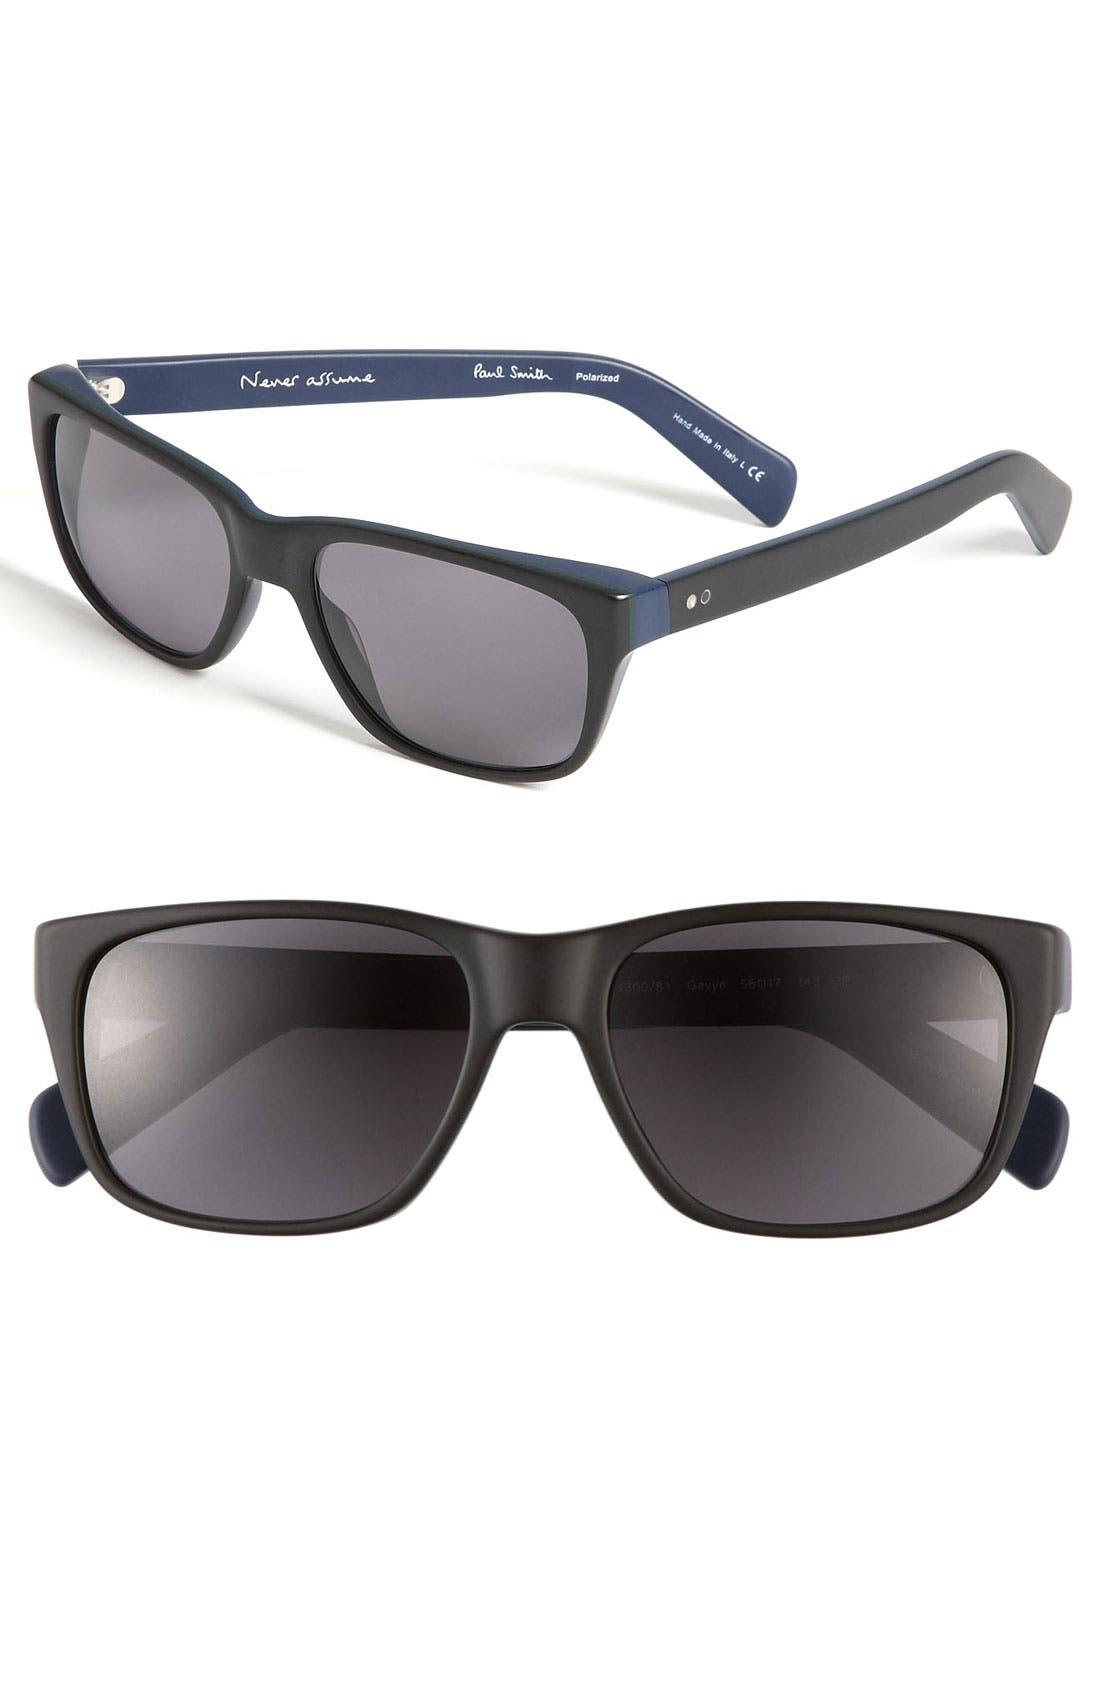 Alternate Image 1 Selected - Paul Smith 'Gavyn' Polarized Sunglasses